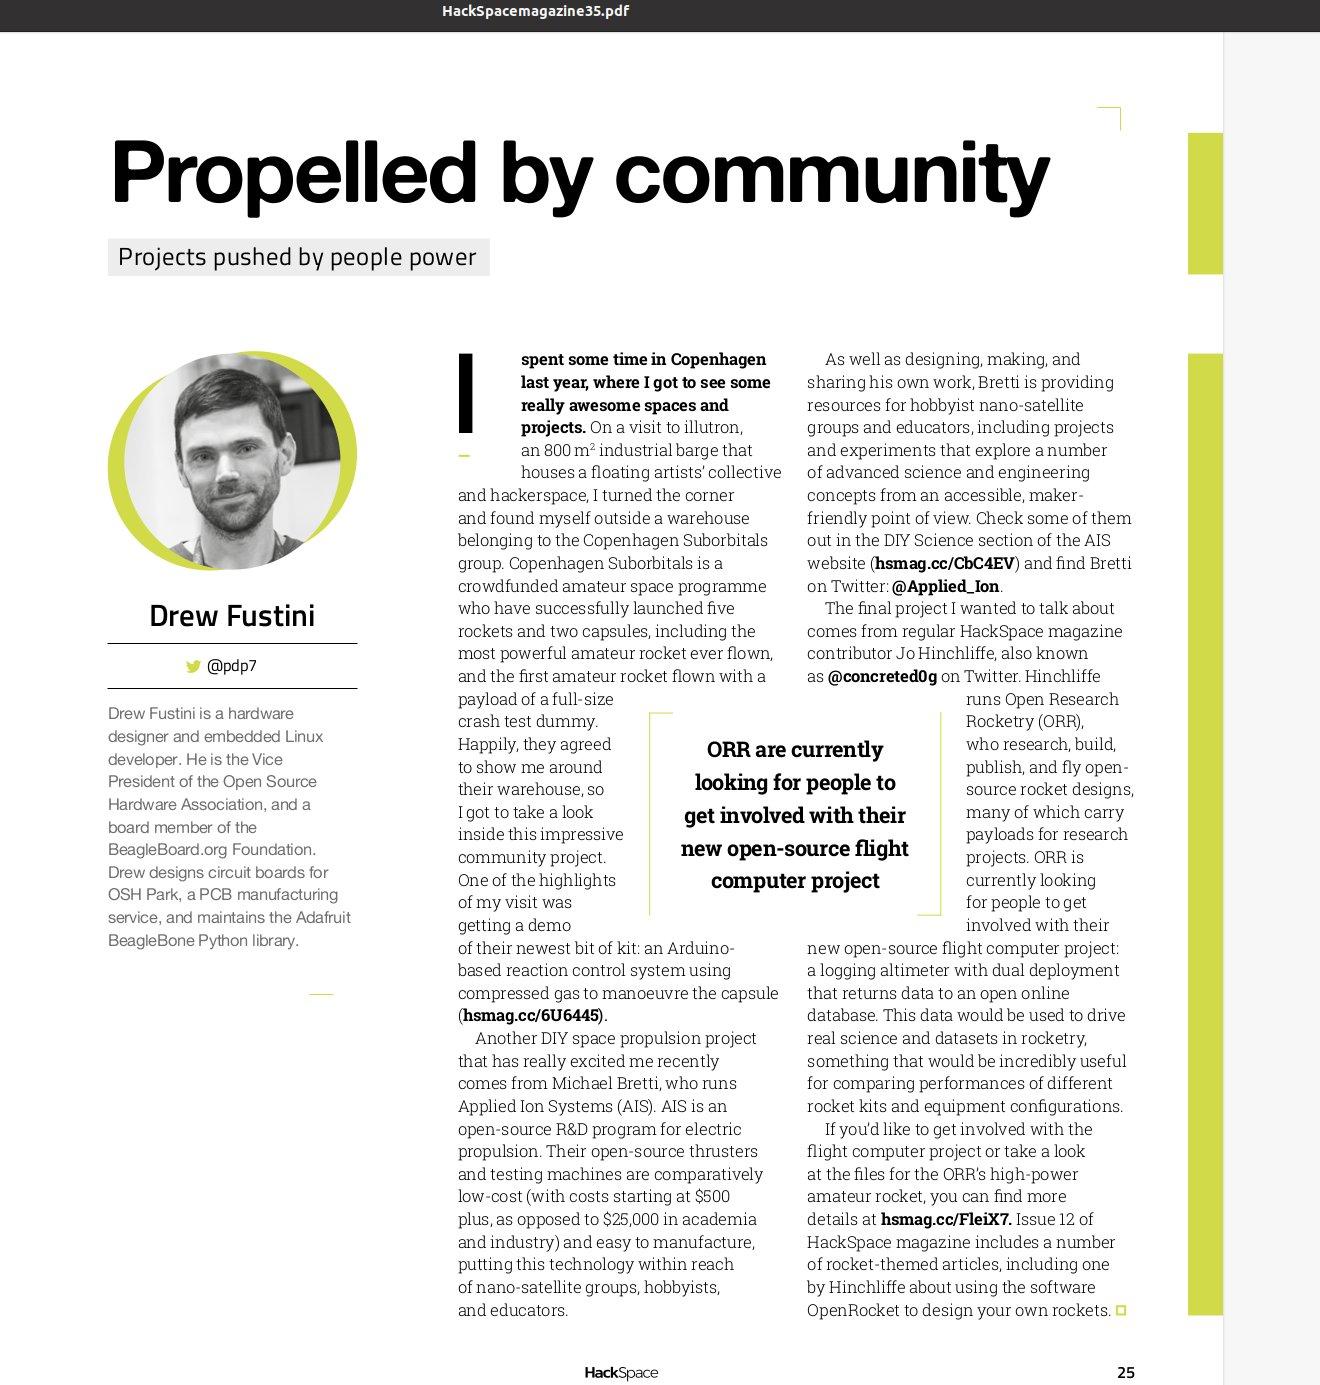 Hackspace Magazine Issue 35